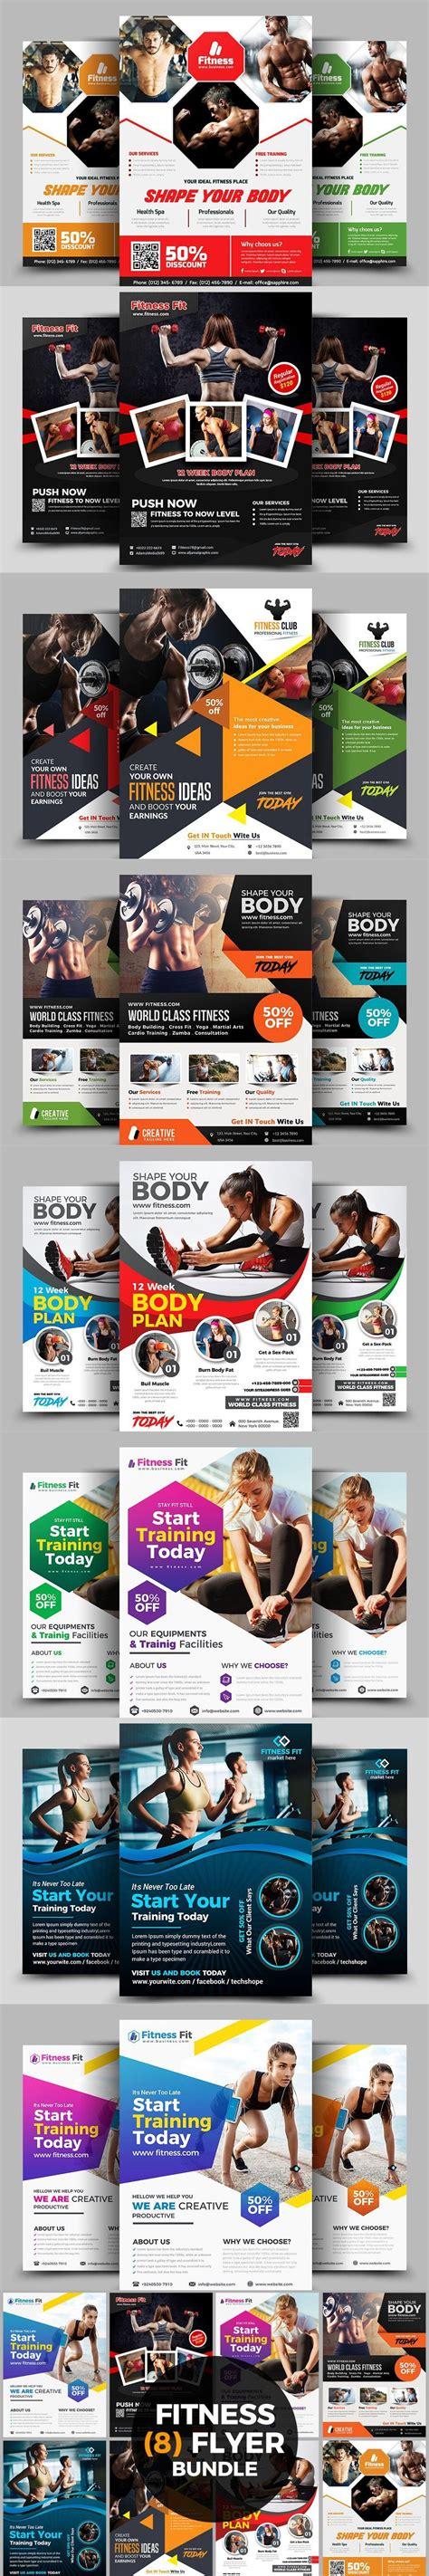 fitness flyer bundle print templates  images